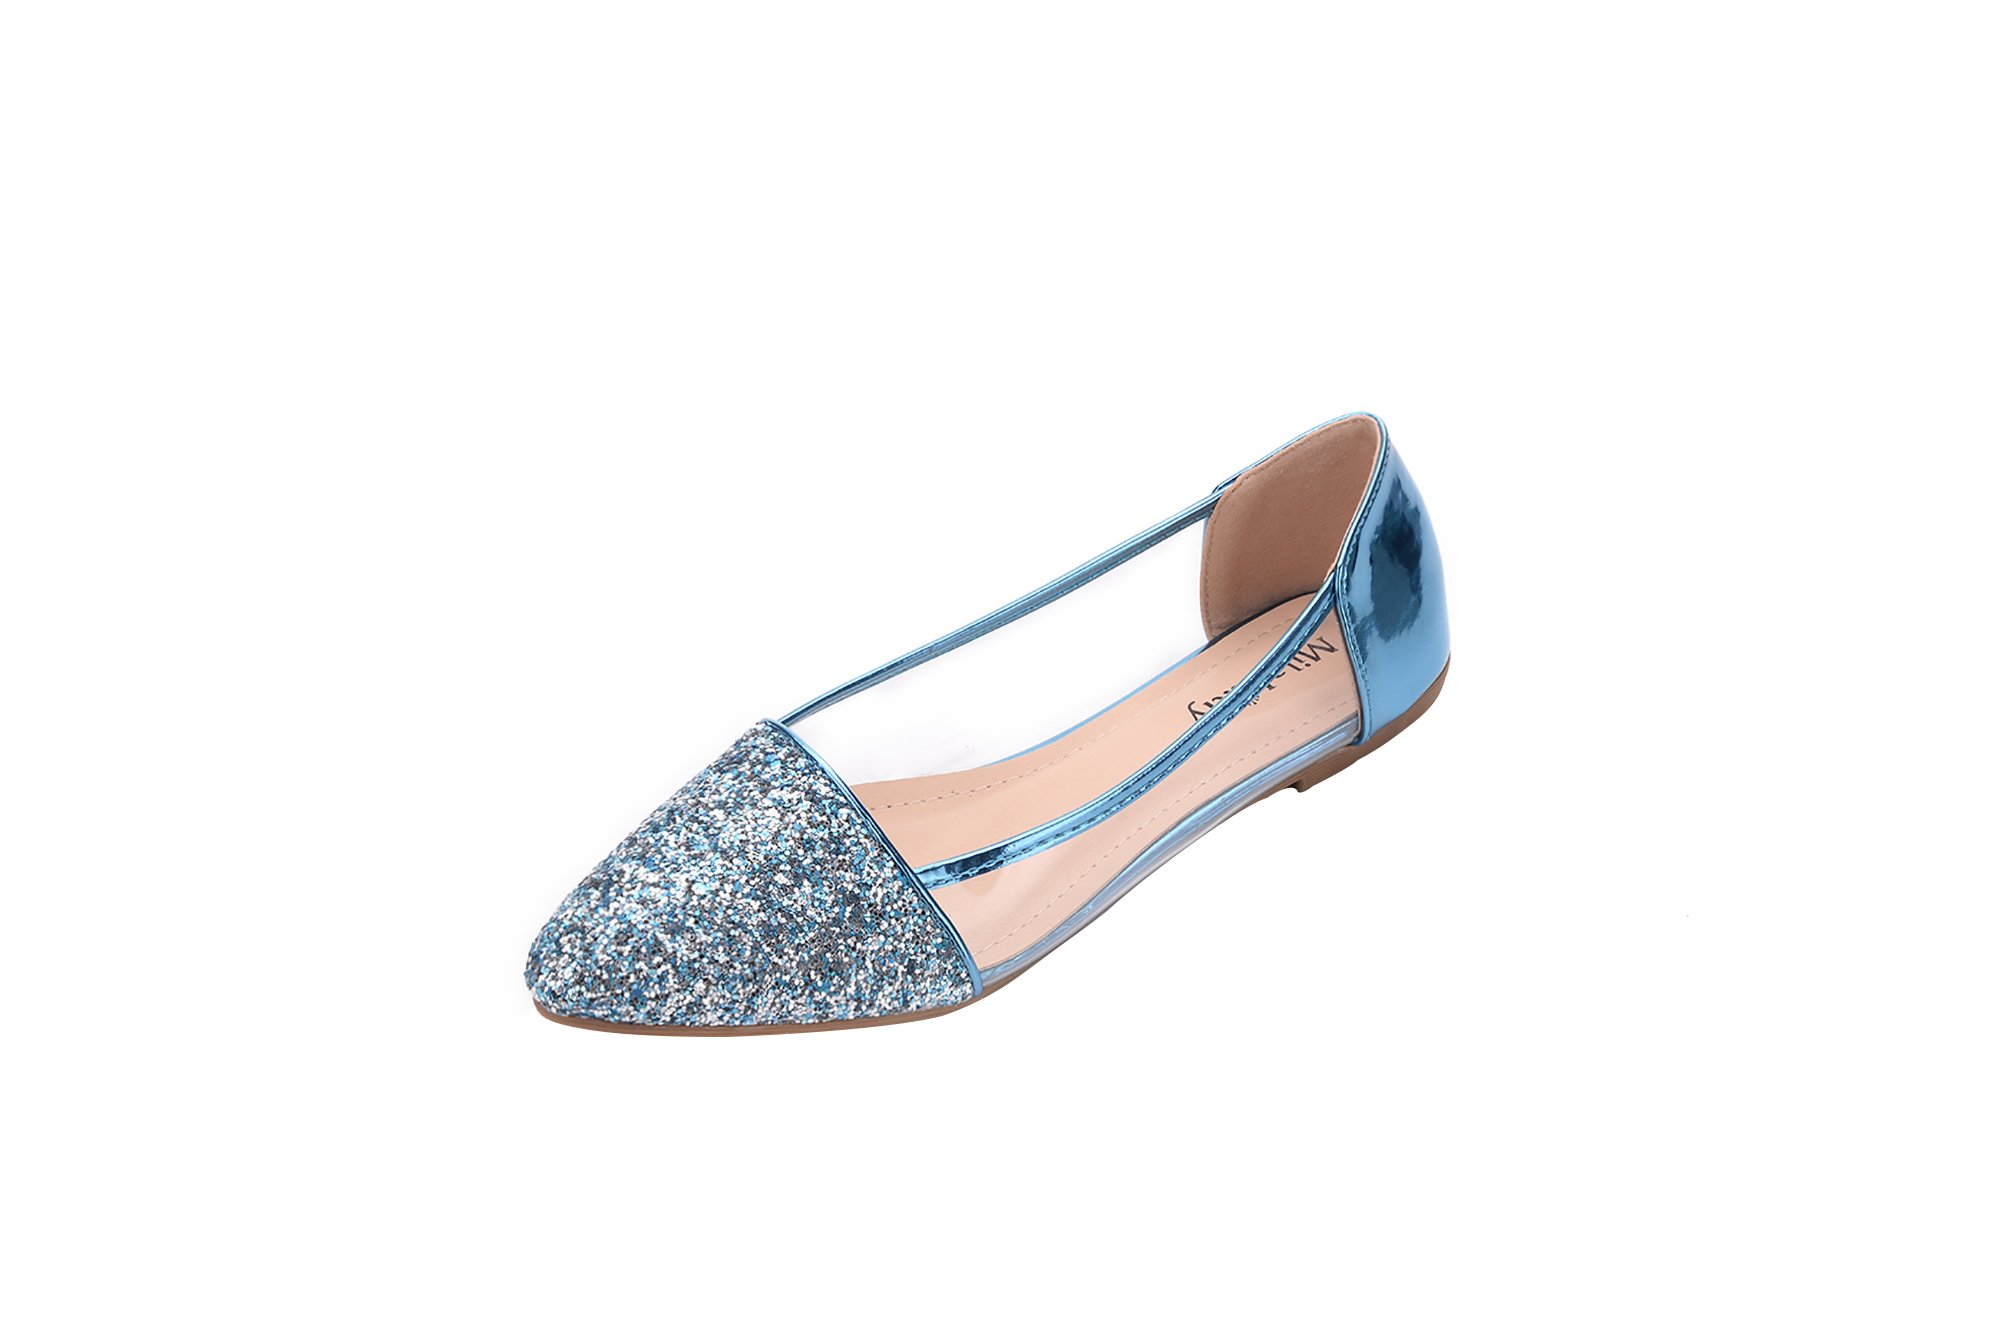 Mila Lady (Mavis Fashion New Sparkling Embellish Glitter Slip Loafer Ballet Flat Shoes. BLUE7.5